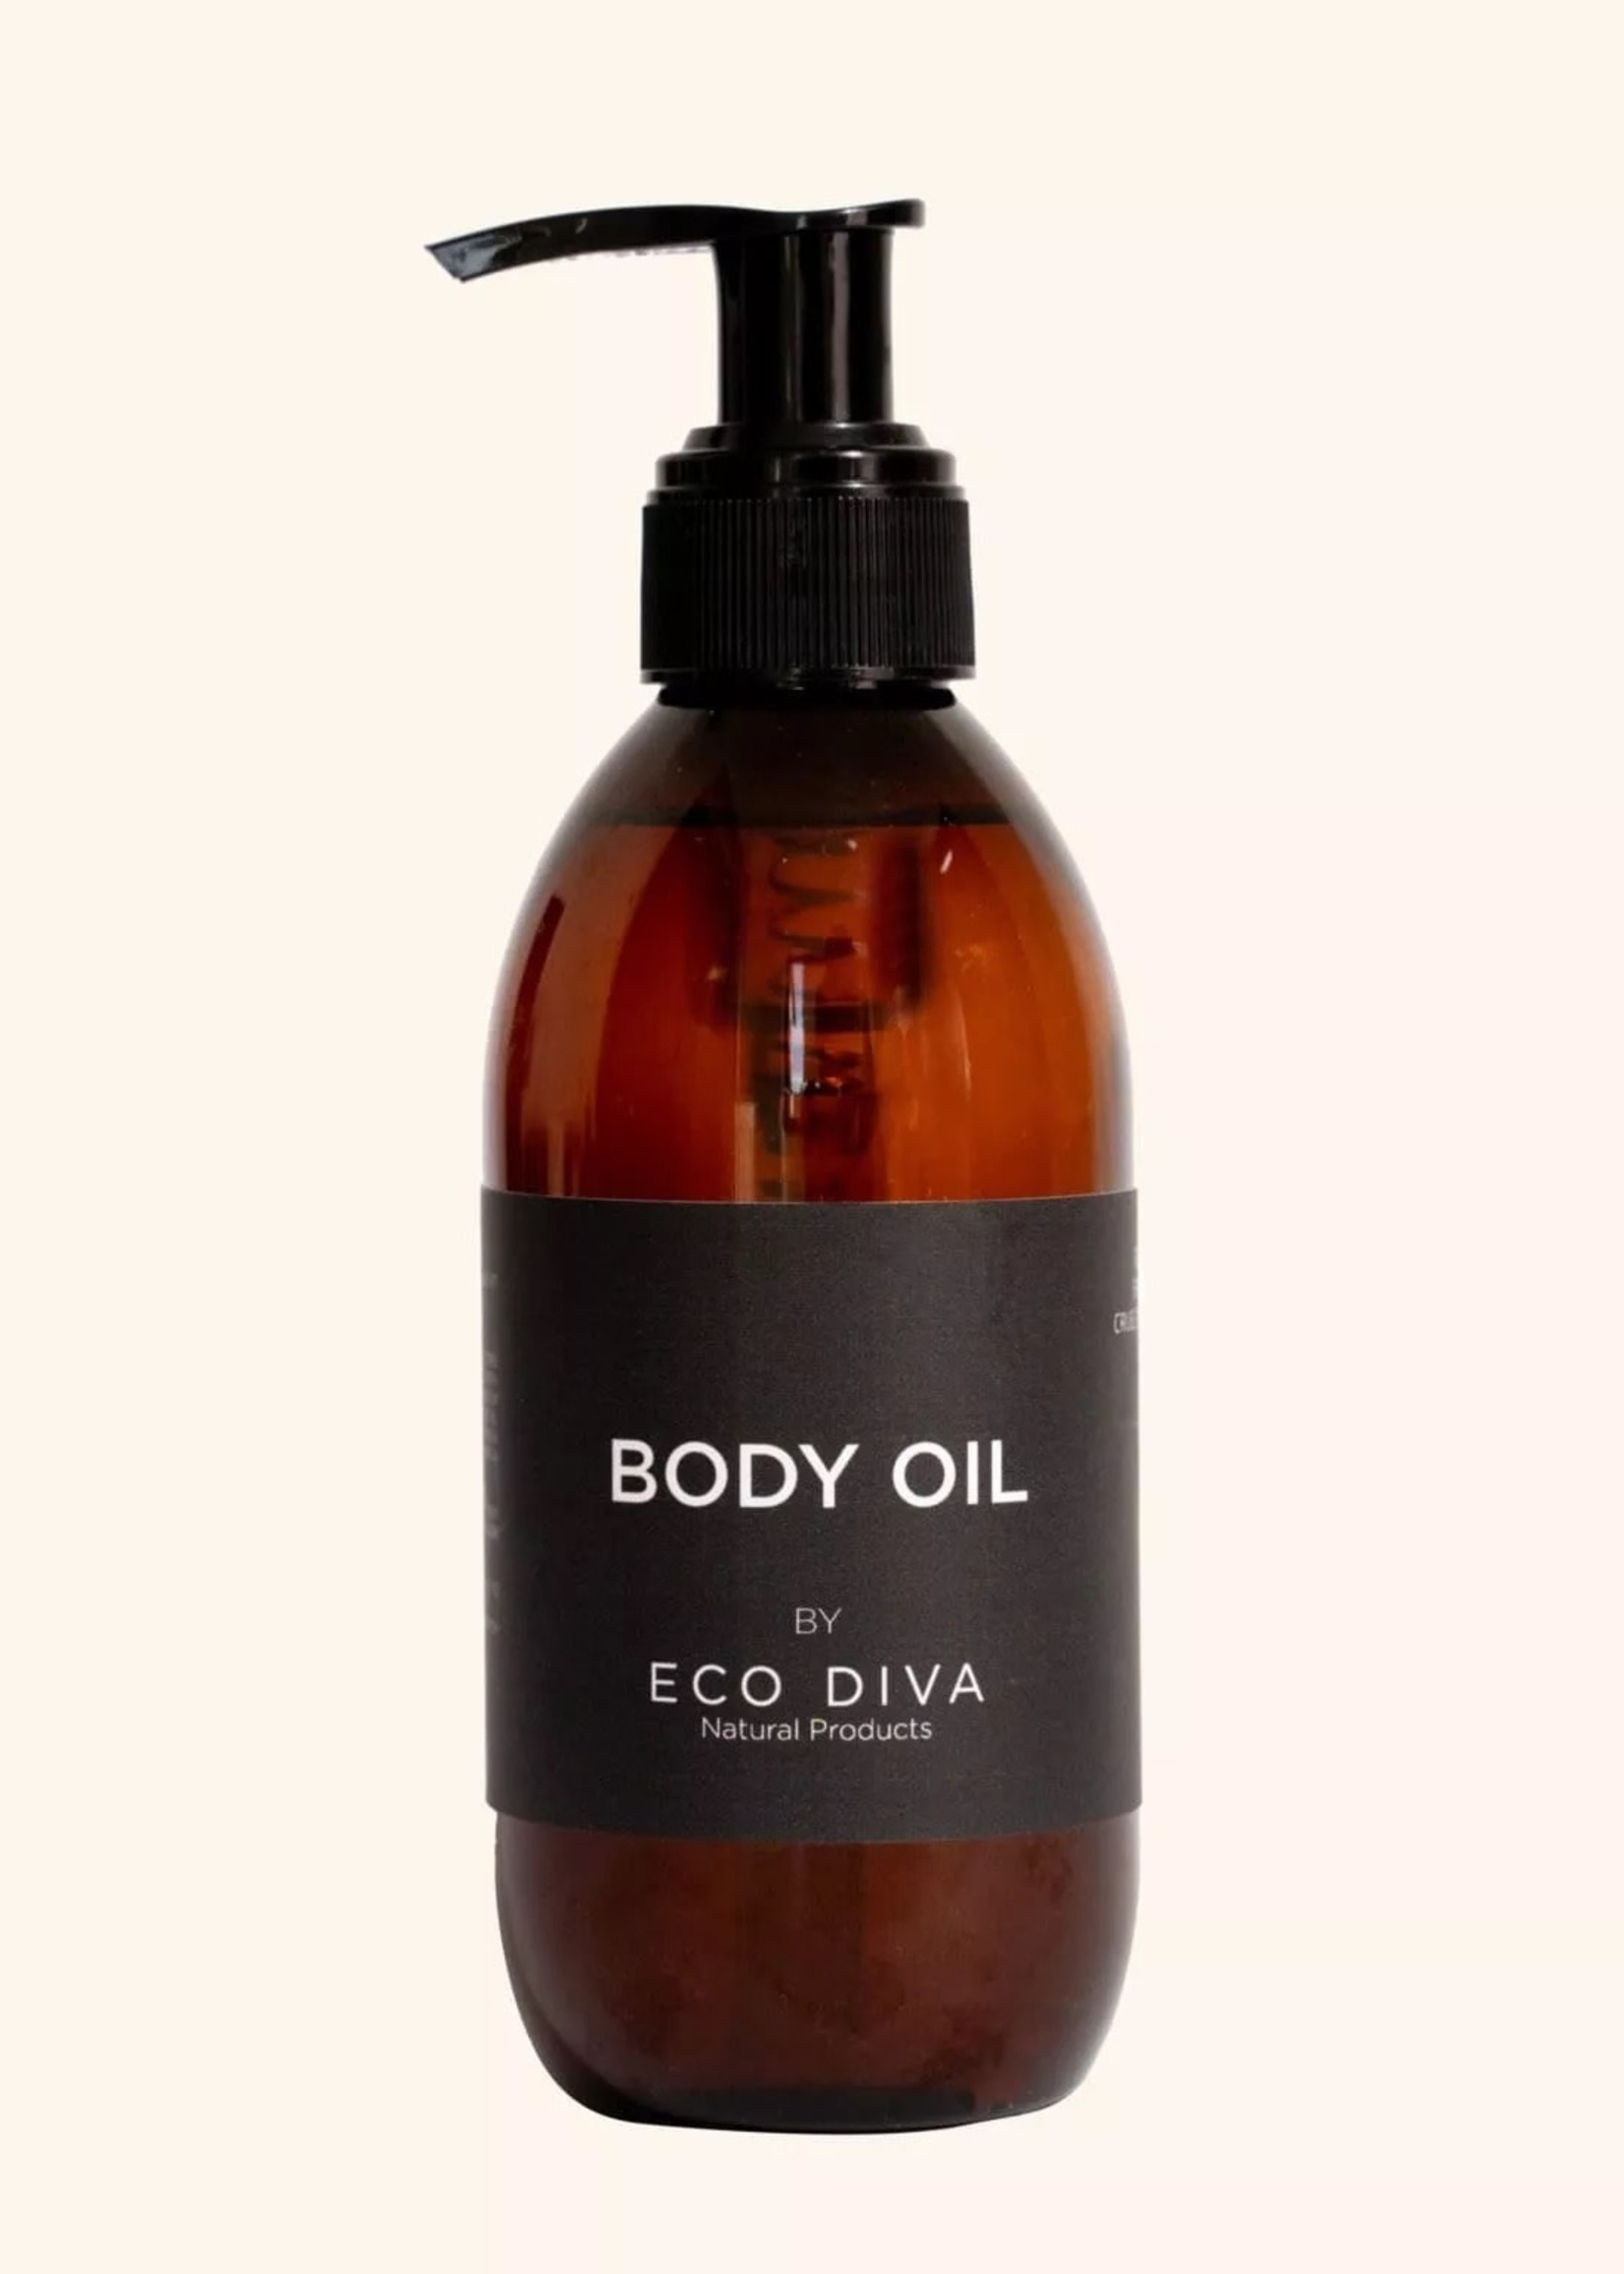 Eco Diva Eco Diva - Body oil 200ml